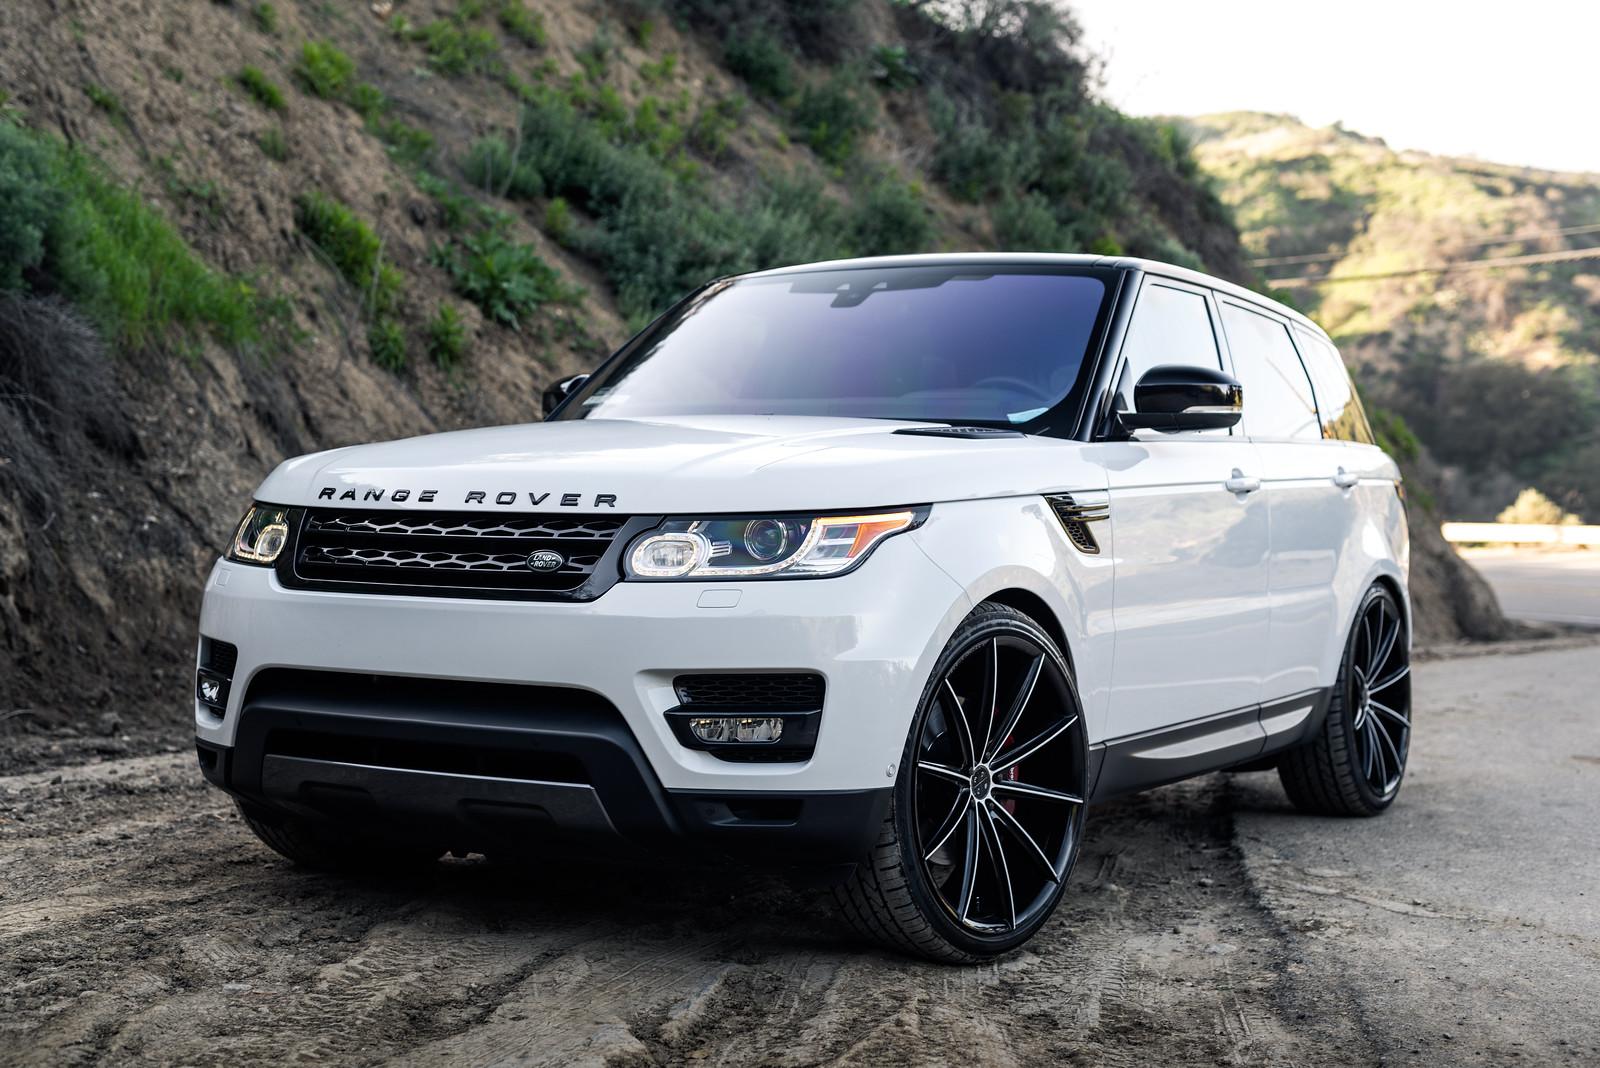 2018_Range_Rover_Sport_BD11_WhiteBlack (12)